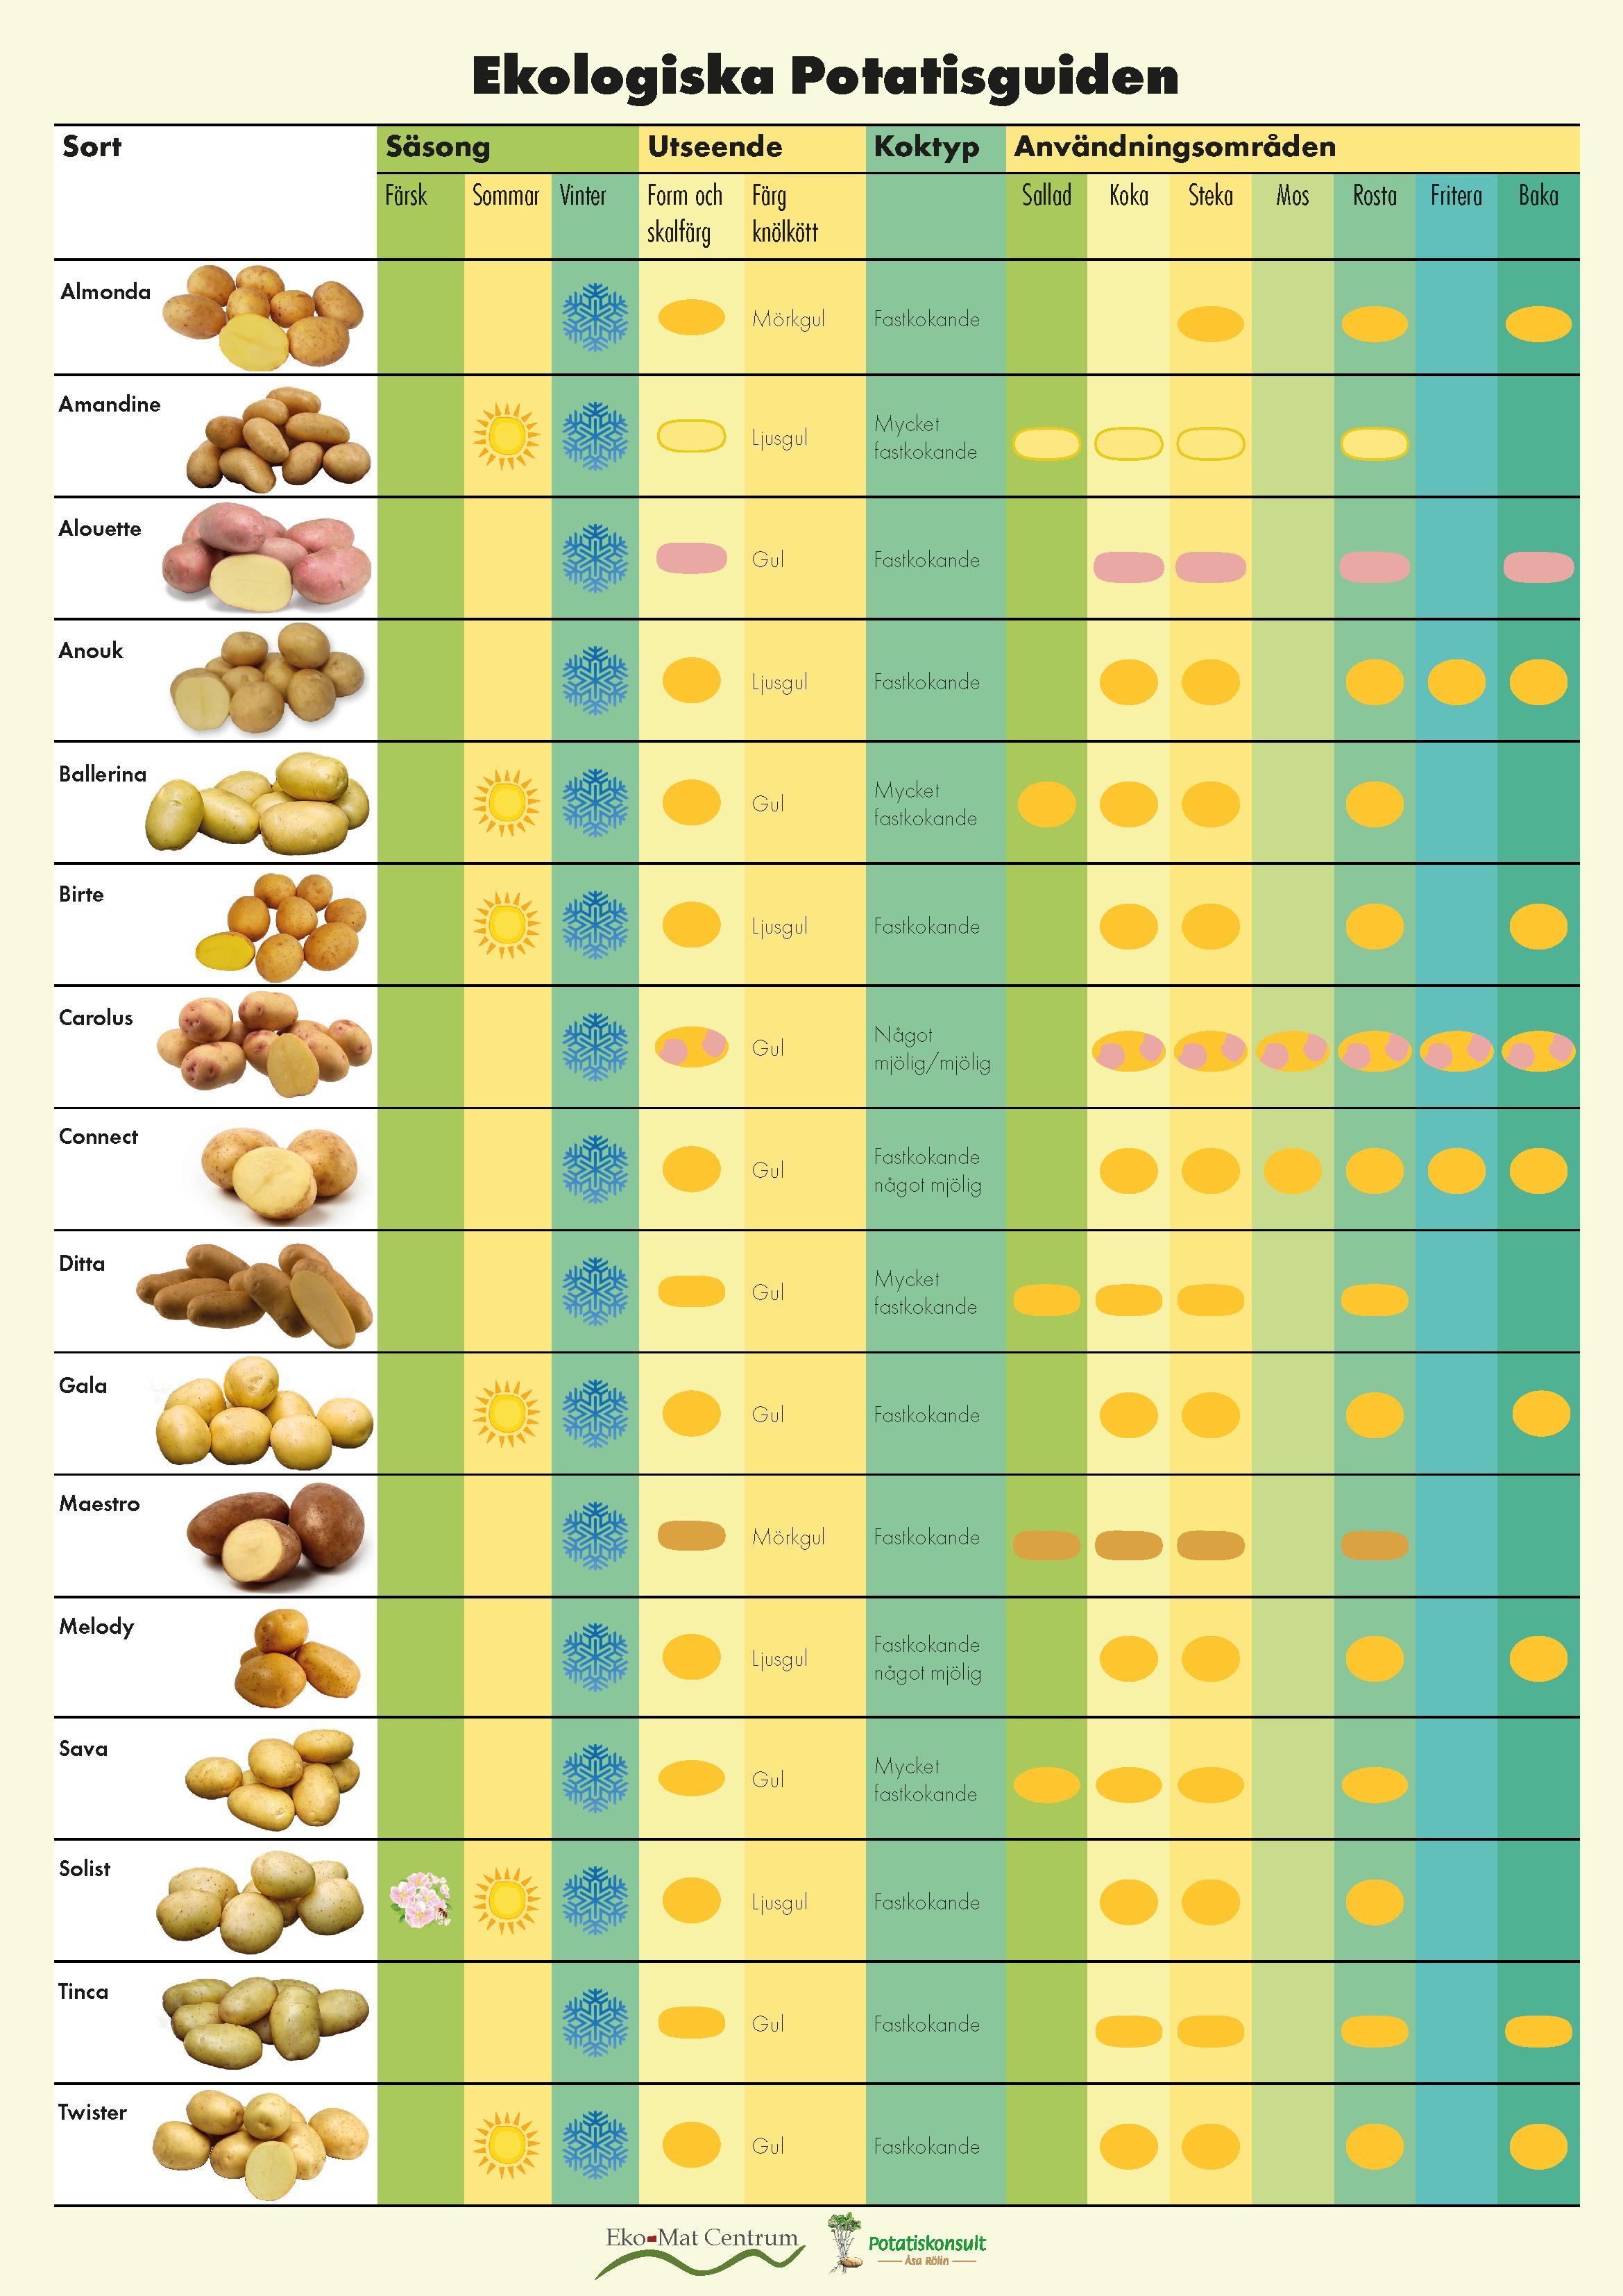 Ekologiska potatisguiden